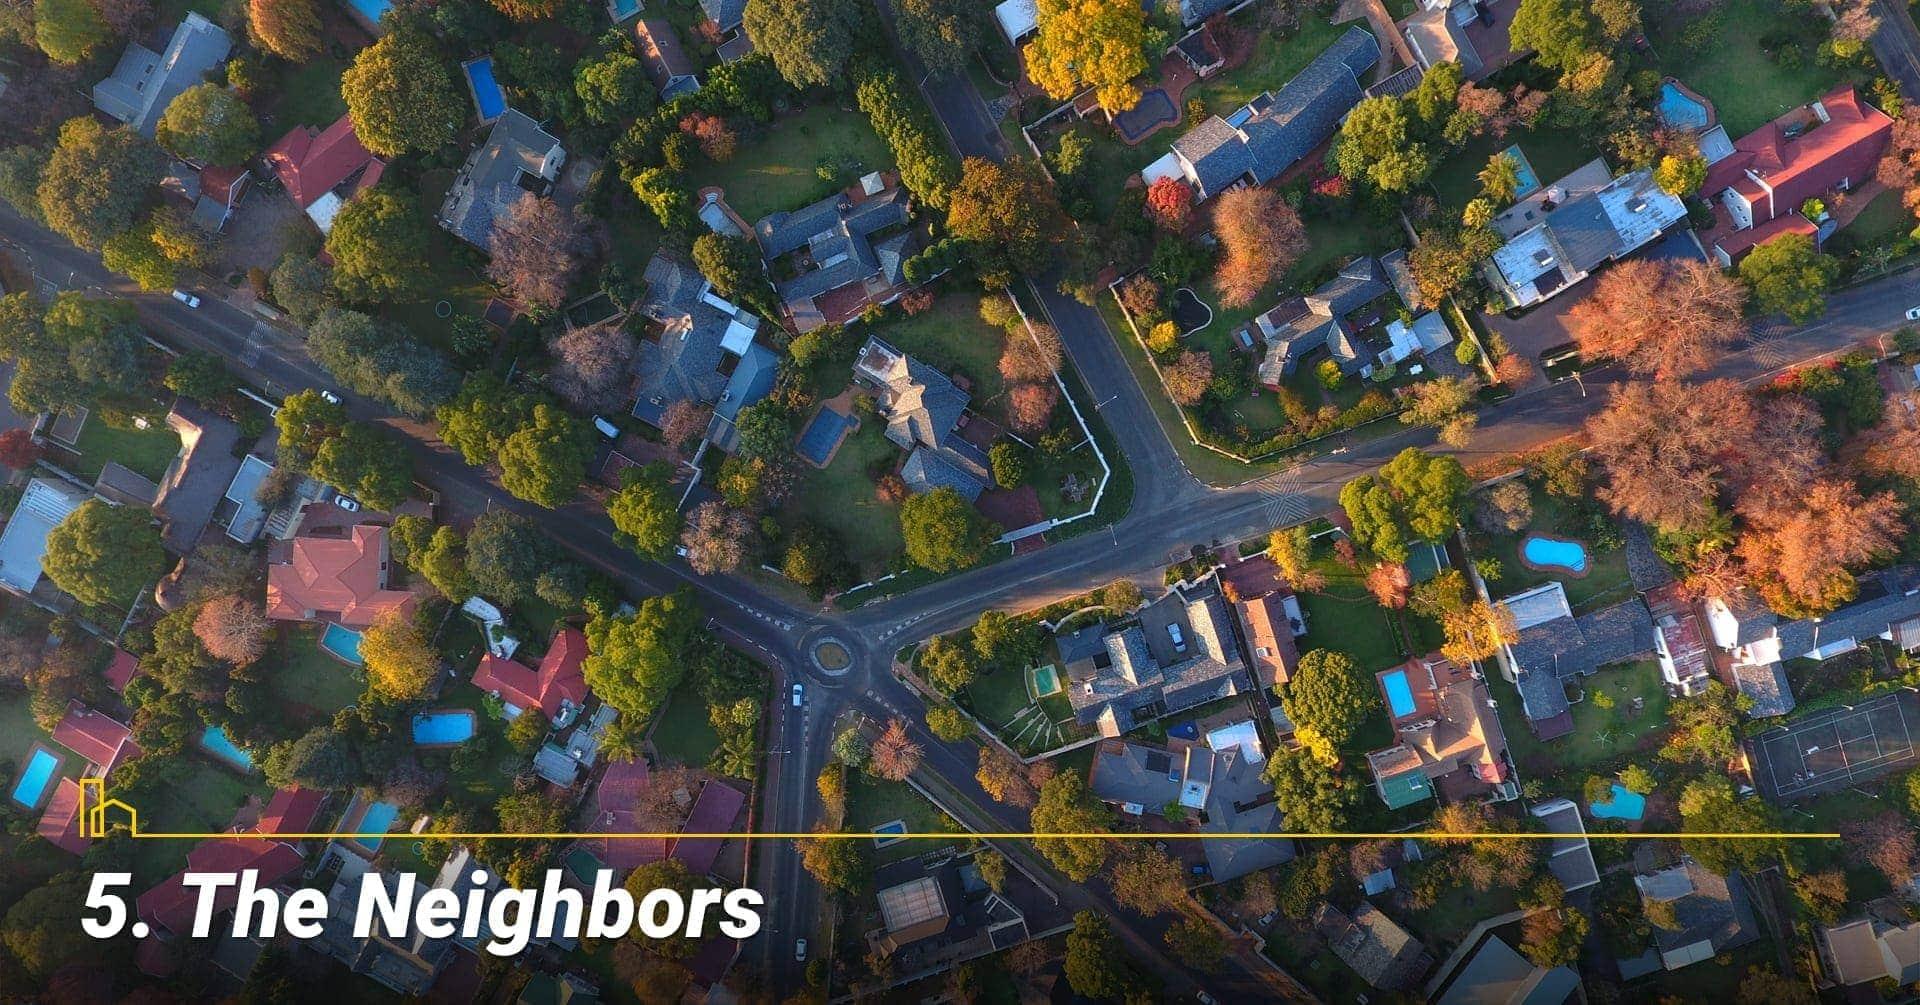 The Neighbors, Look for good neighbors